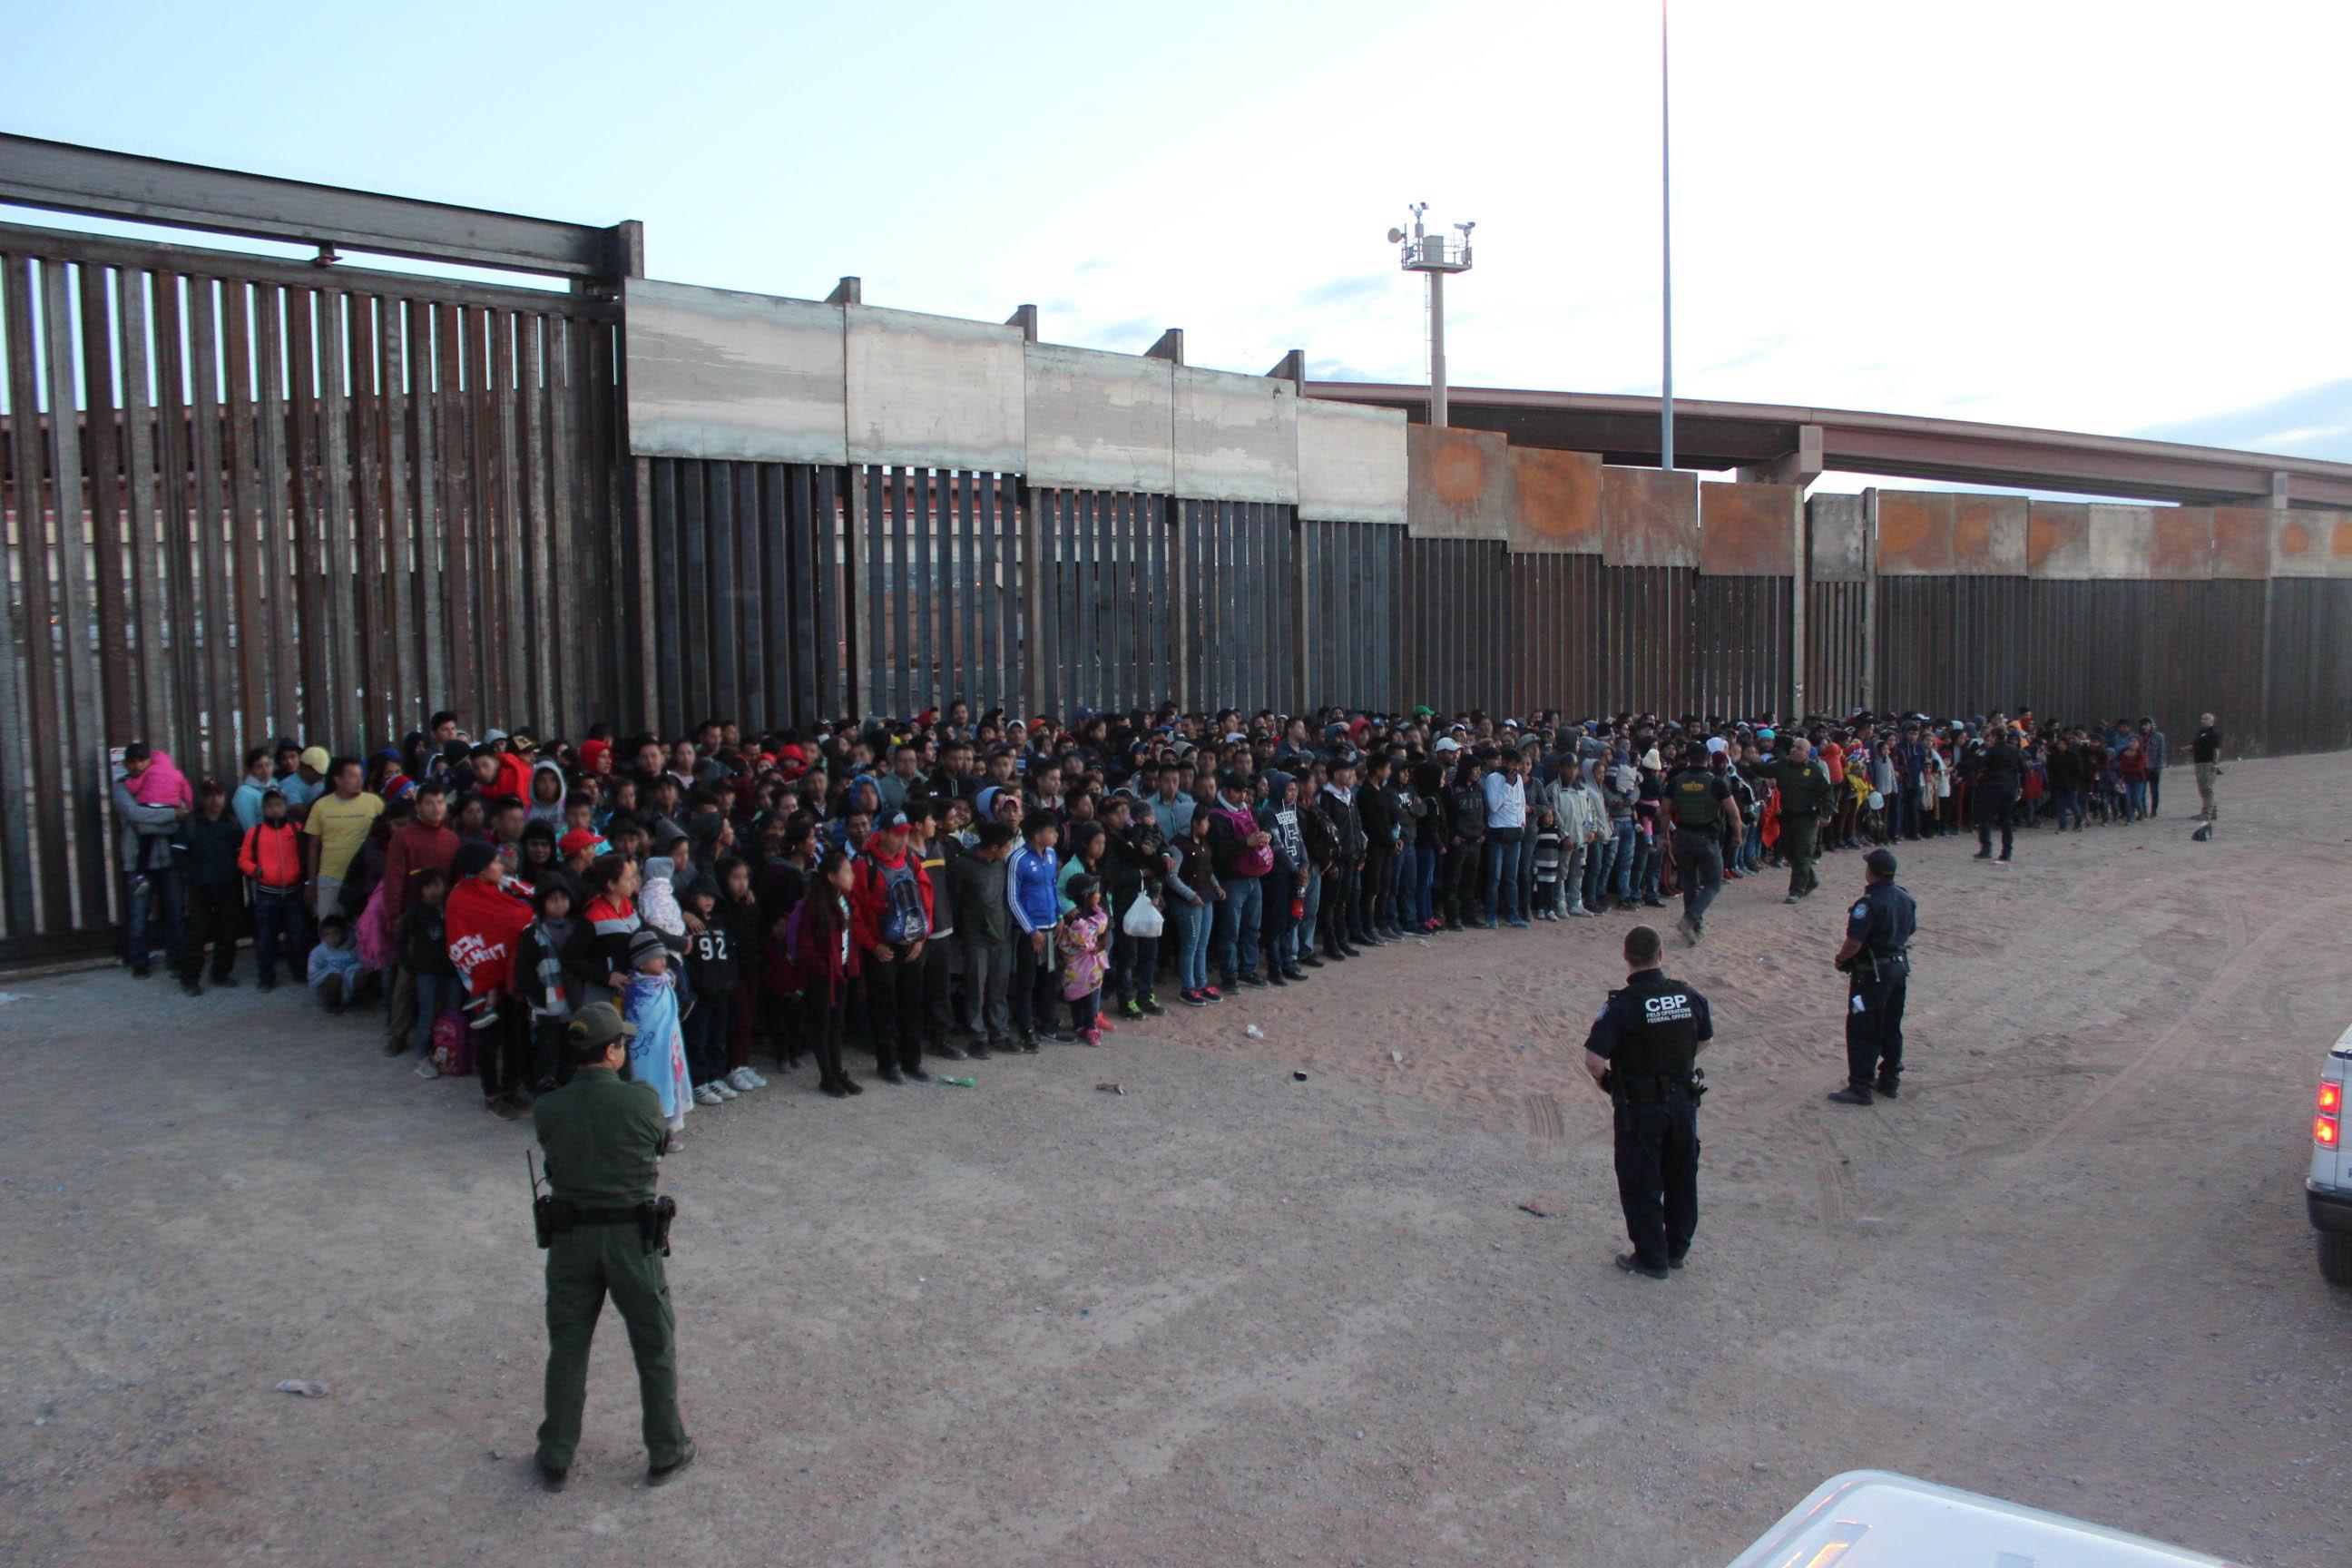 U.S. Border Patrol agents working in El Paso apprehend 1,036 illegal aliens on May 29, 2019.